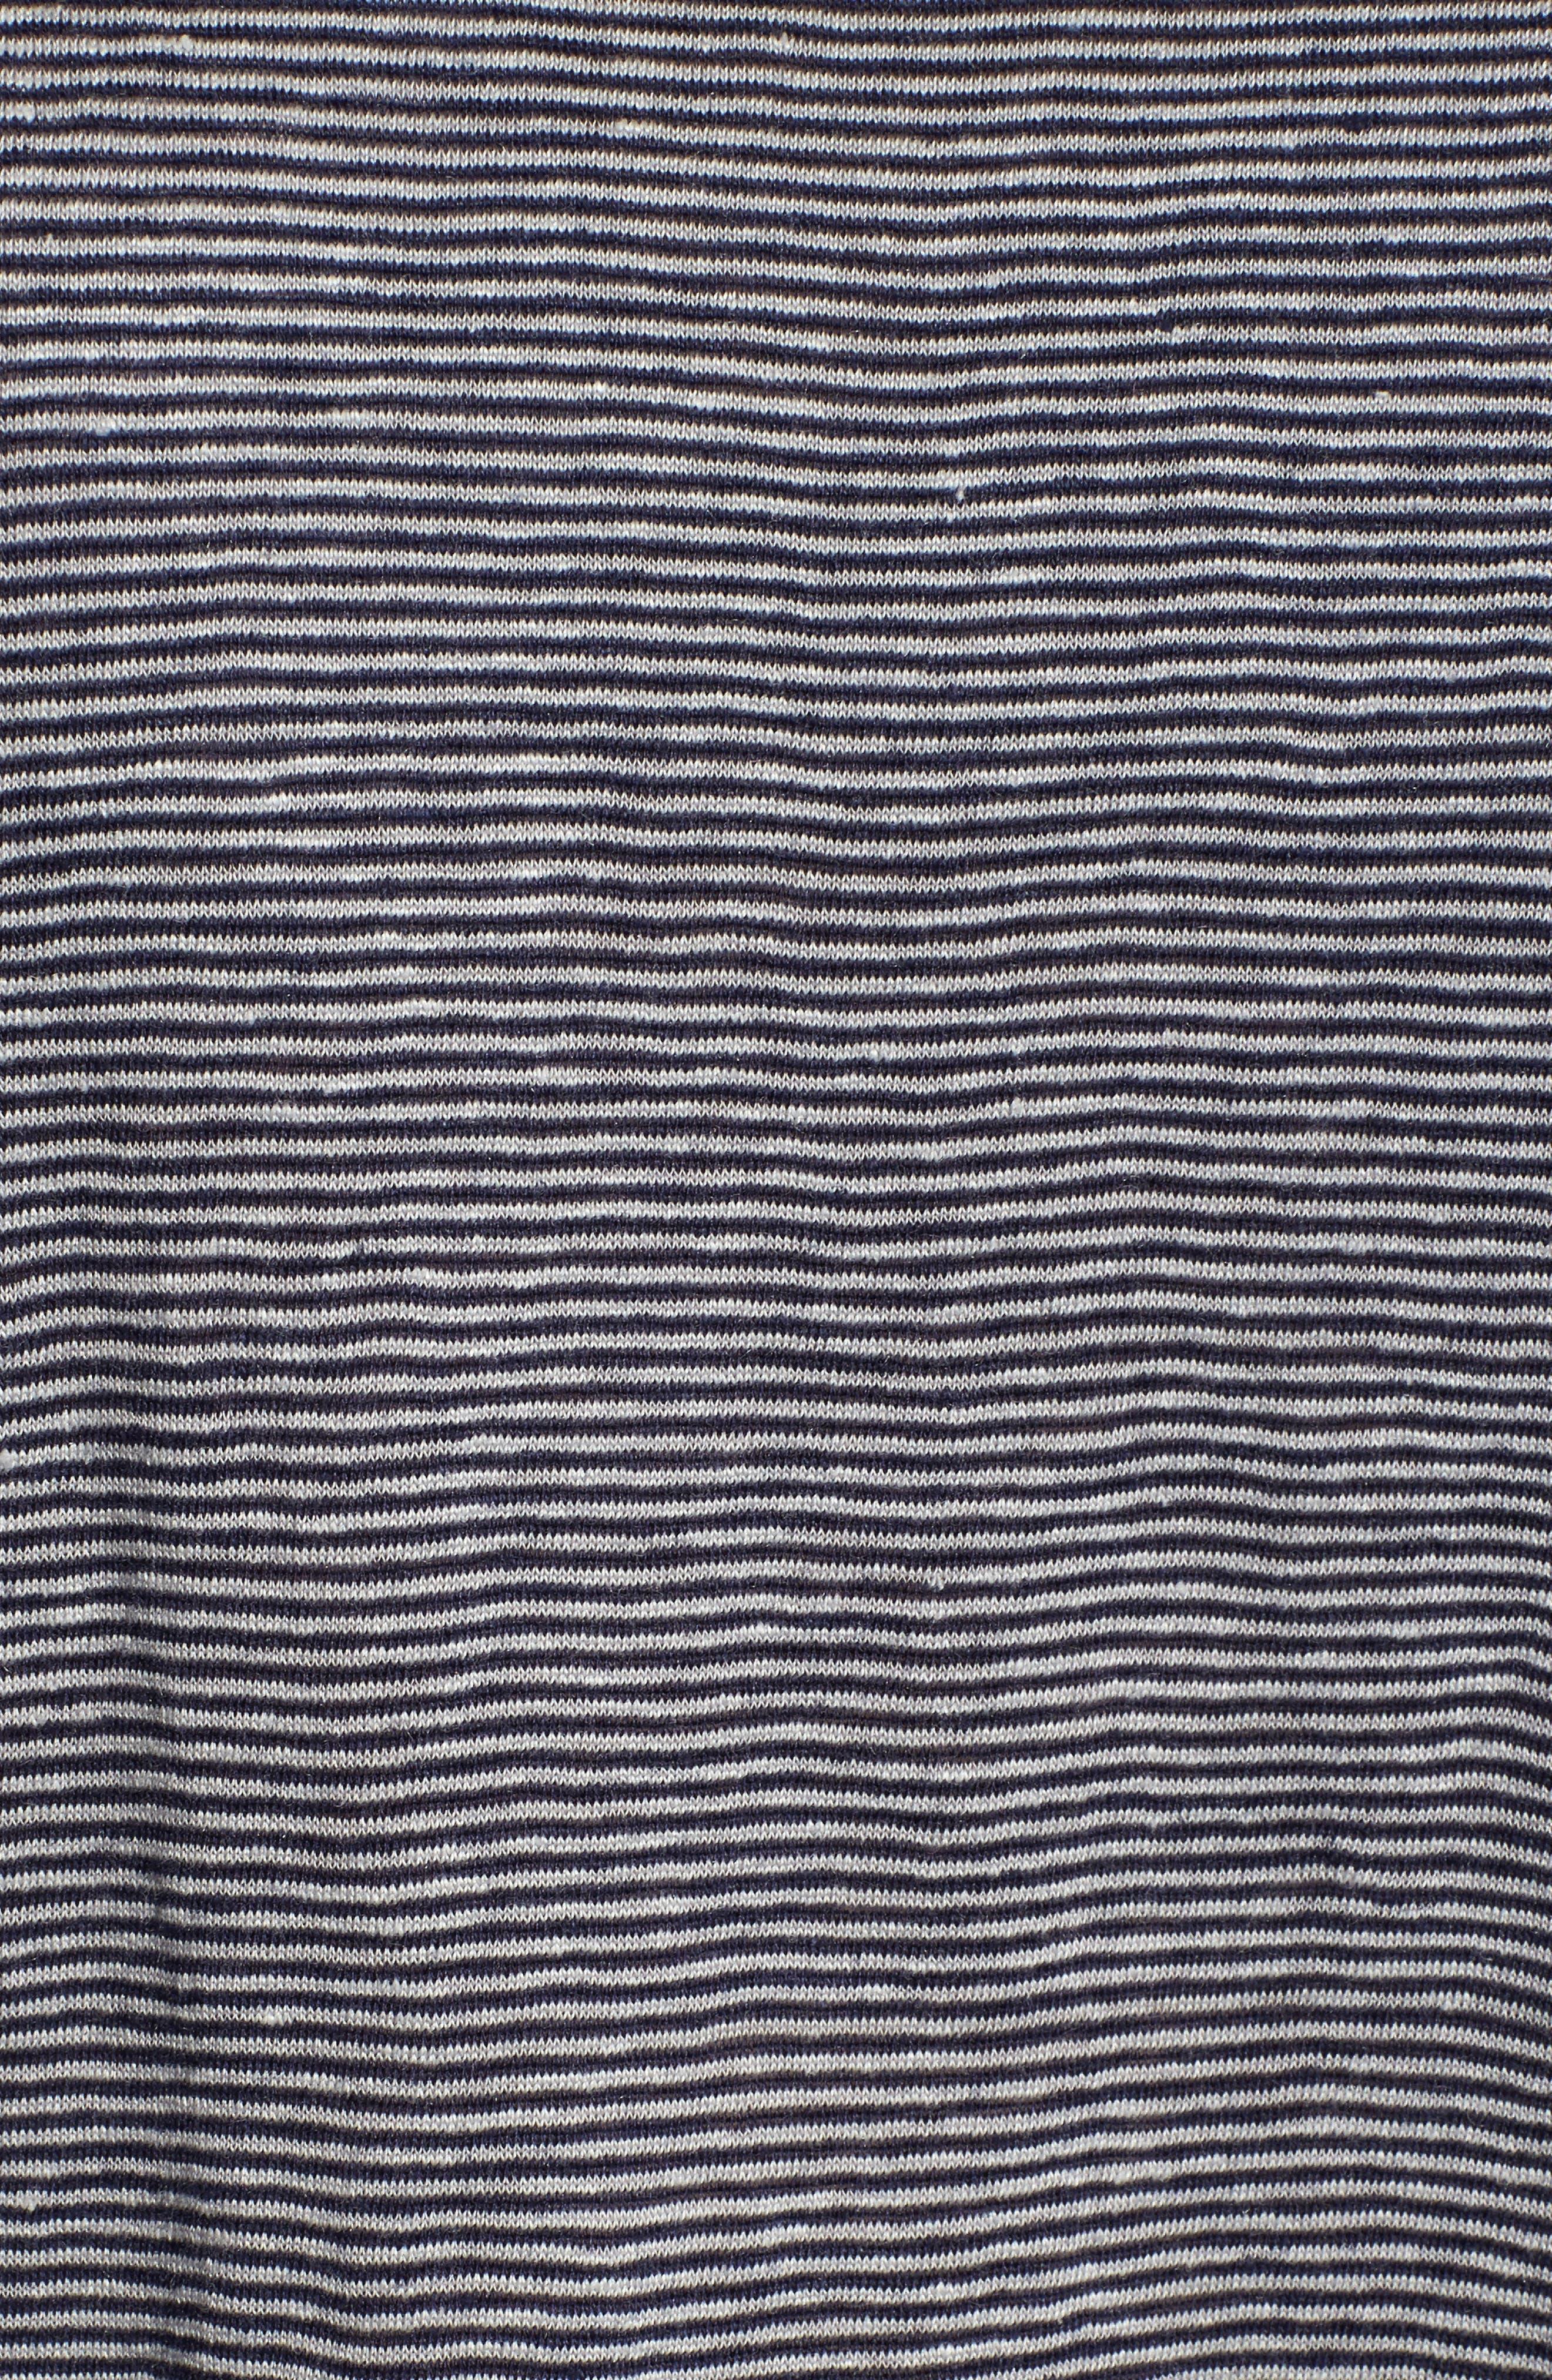 Organic Linen Bateau Neck Top,                             Alternate thumbnail 5, color,                             Midnight